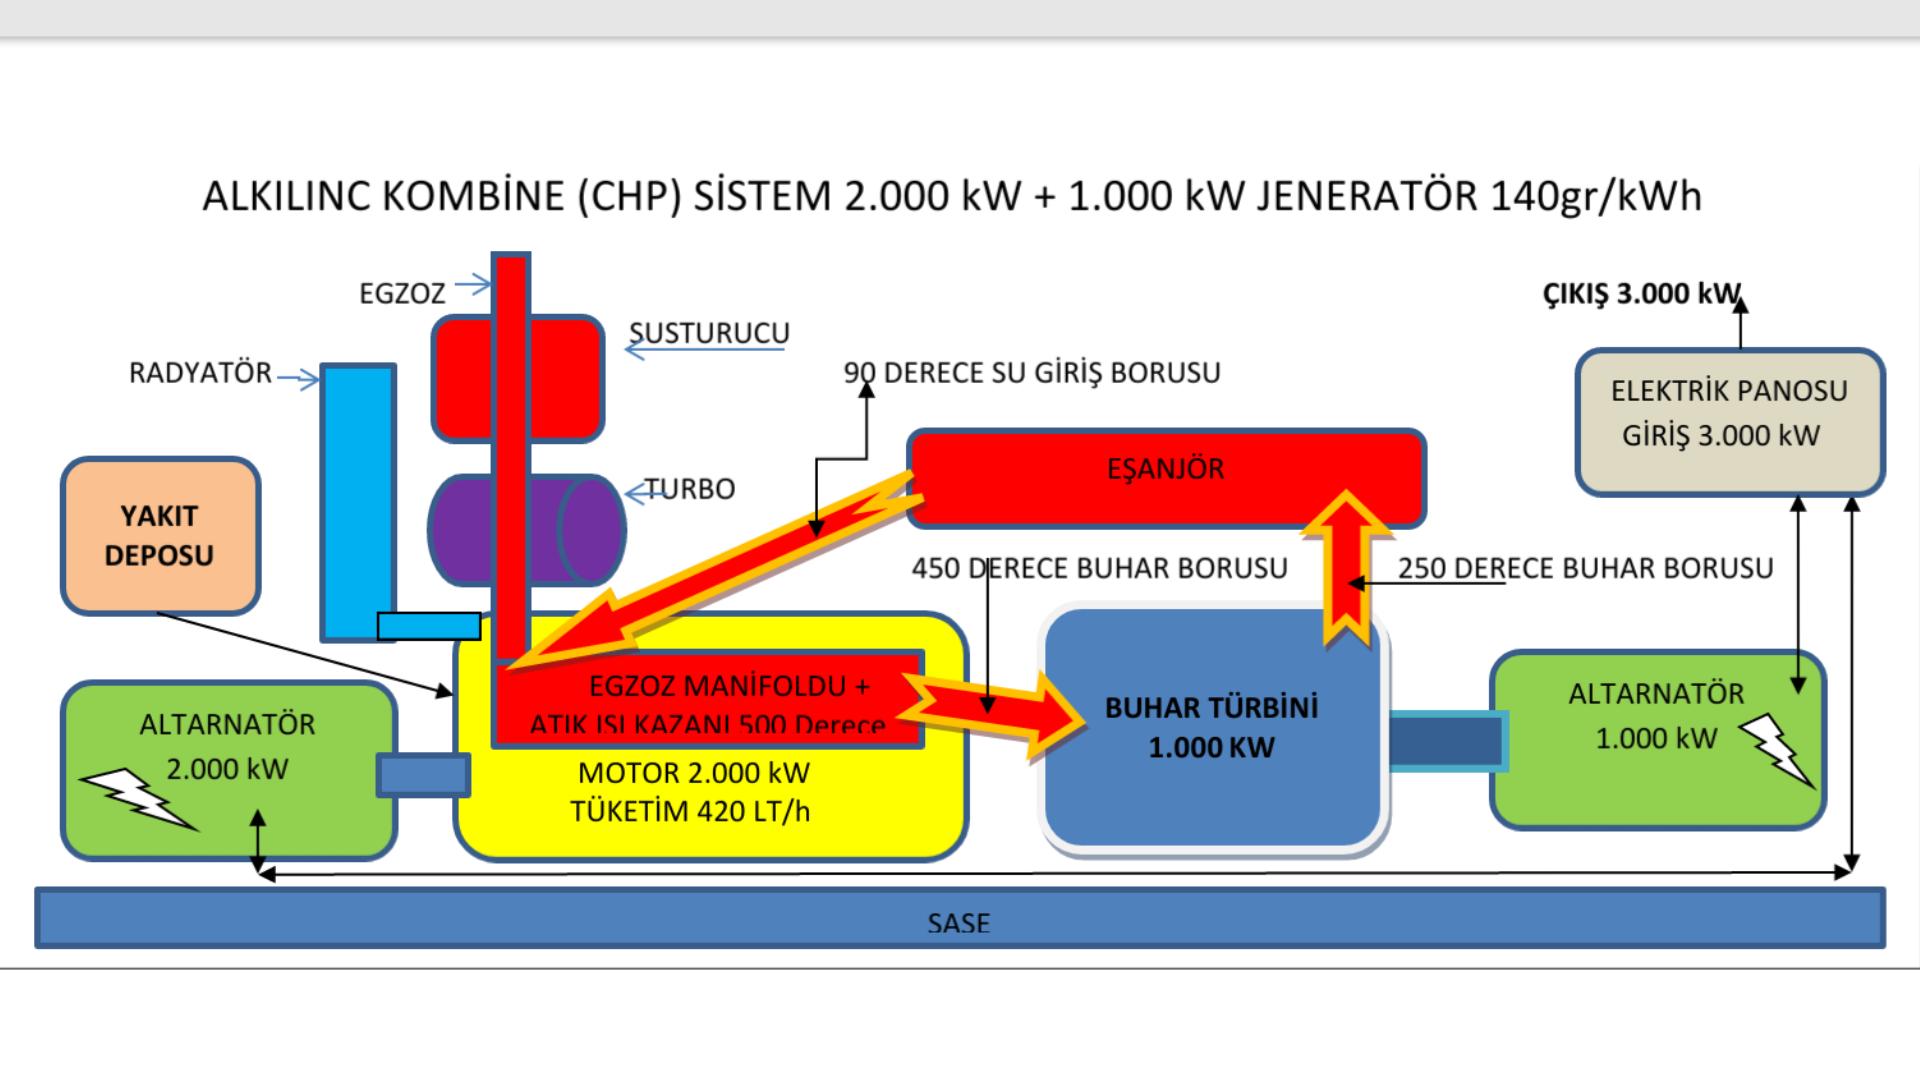 Tamer Alkilinc Adli Kullanicinin Green Energy New Technology Panosundaki Pin Elektrik